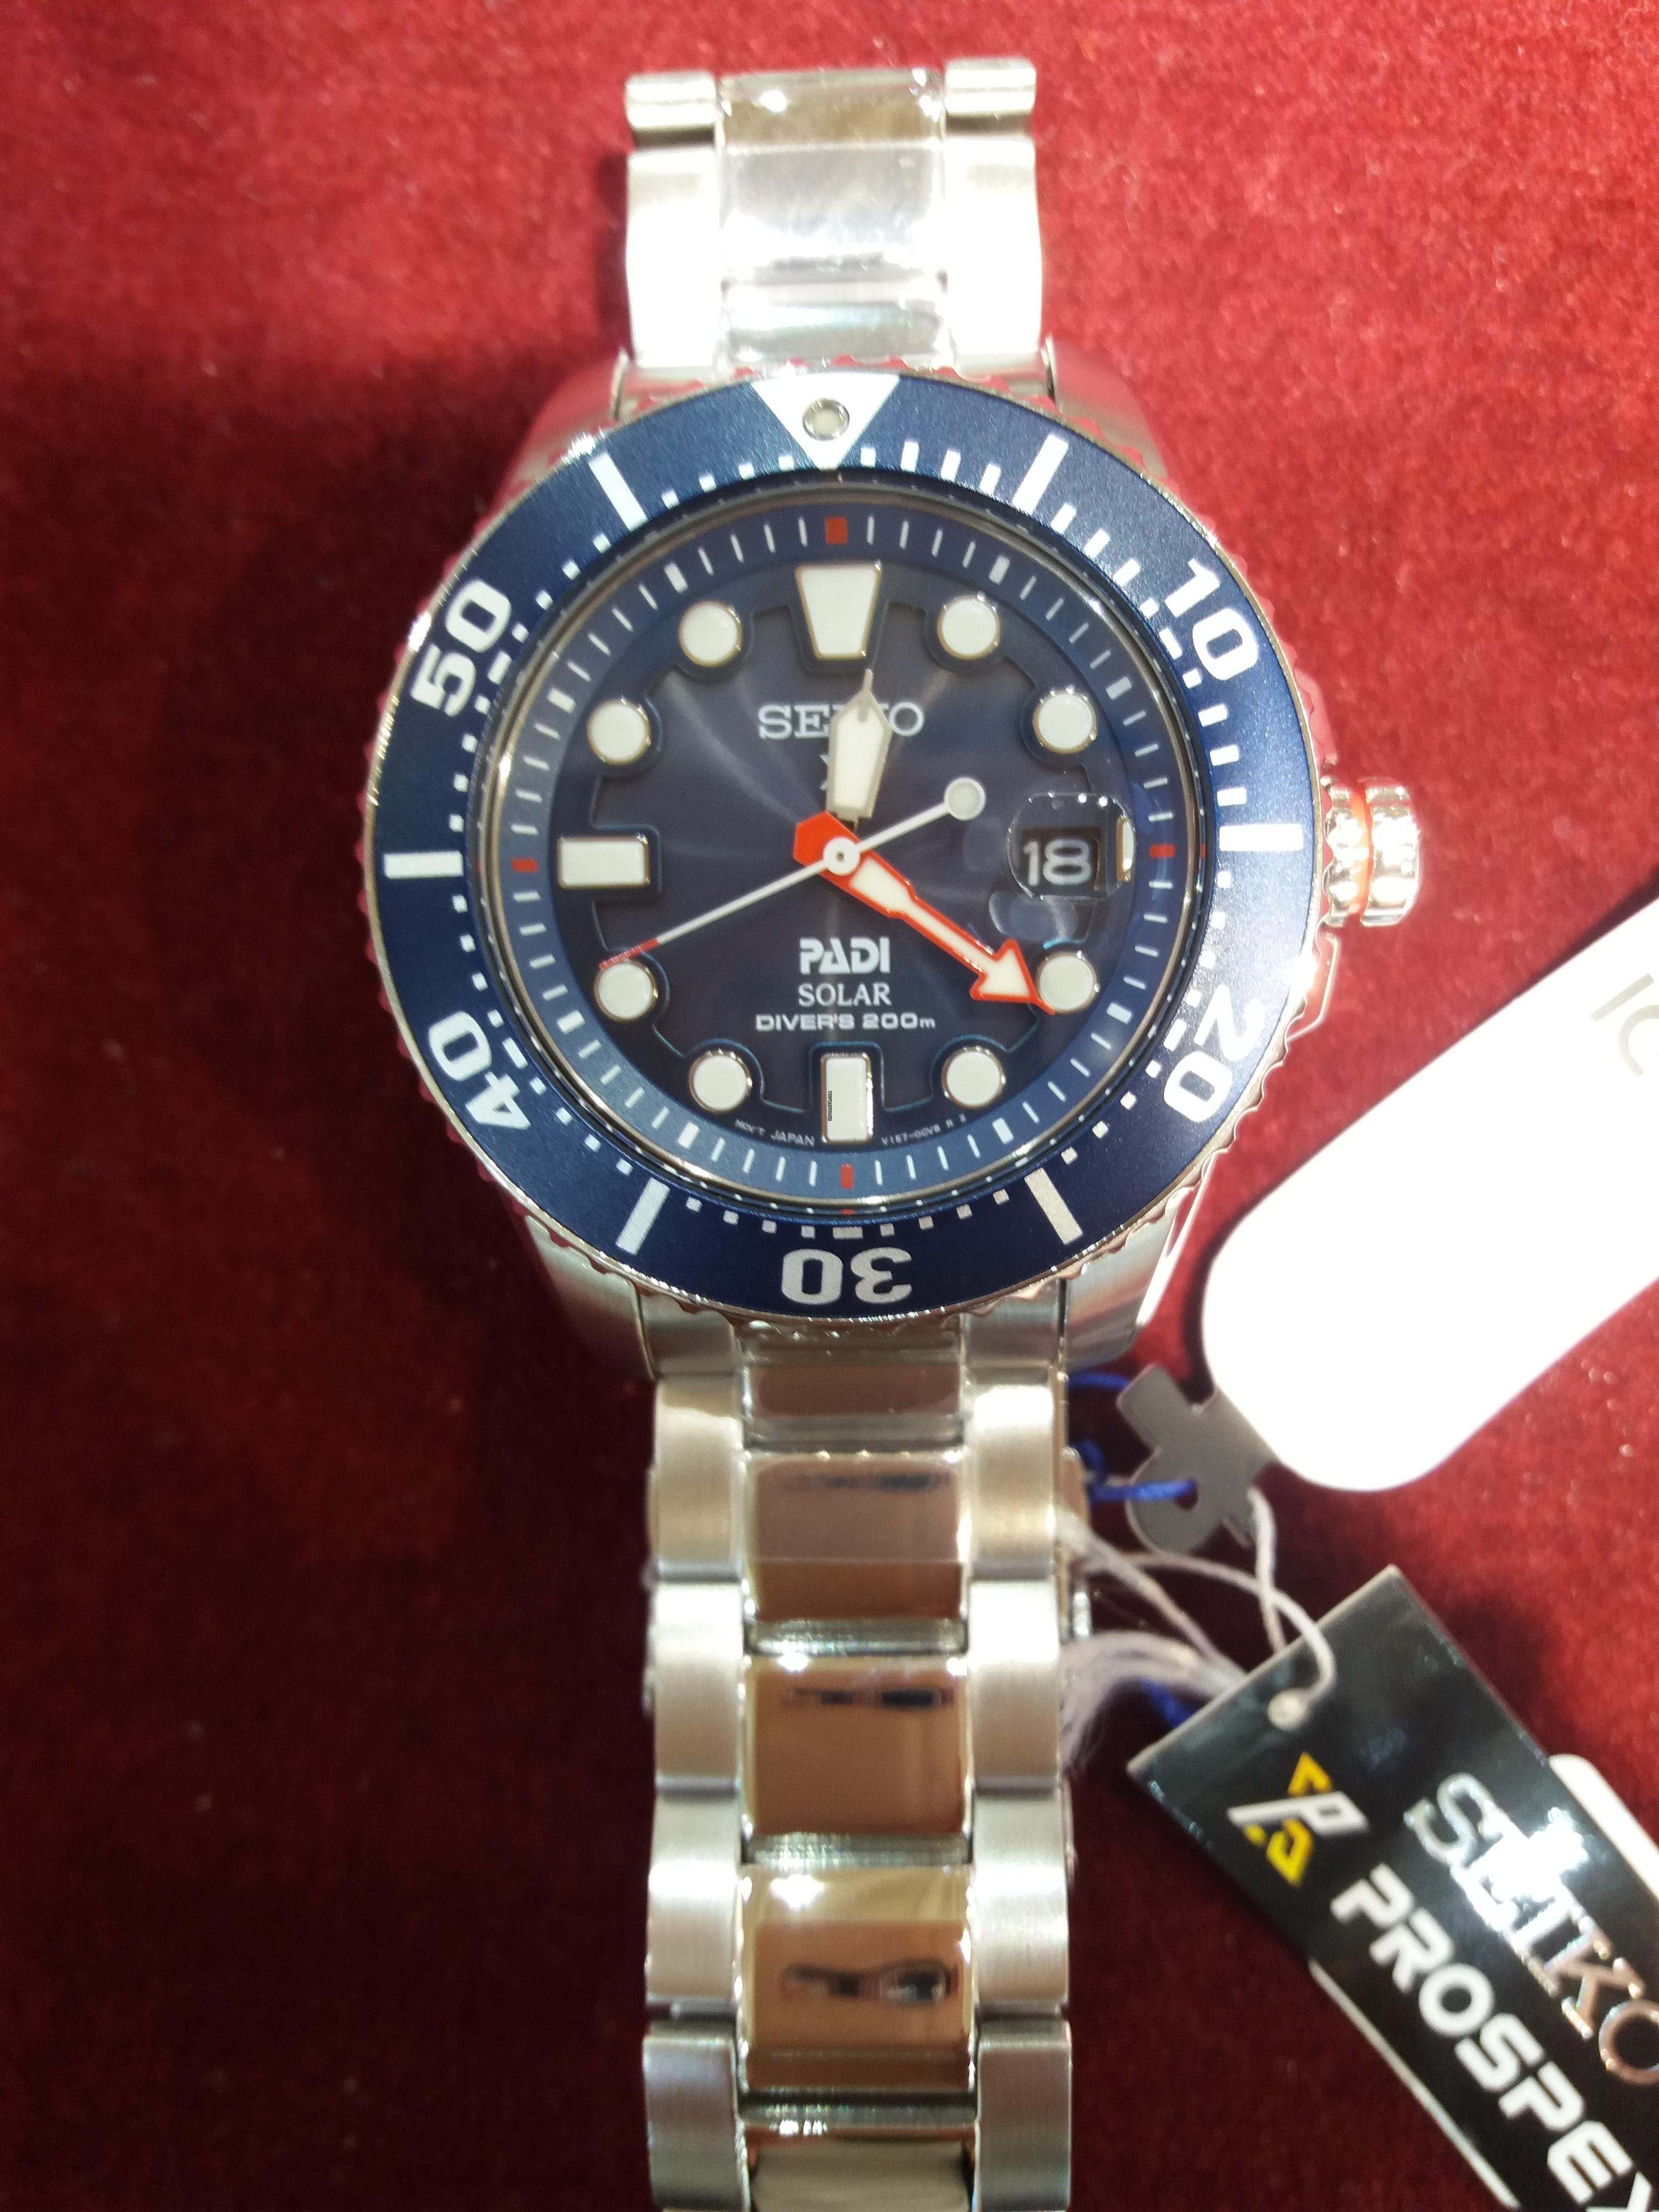 6c0fd640 Seiko Reloj Seiko sne435p1 Padi Prospex colección Mar hombre... en venta  por 340 € por parte de un Vendedor privado de Chrono24